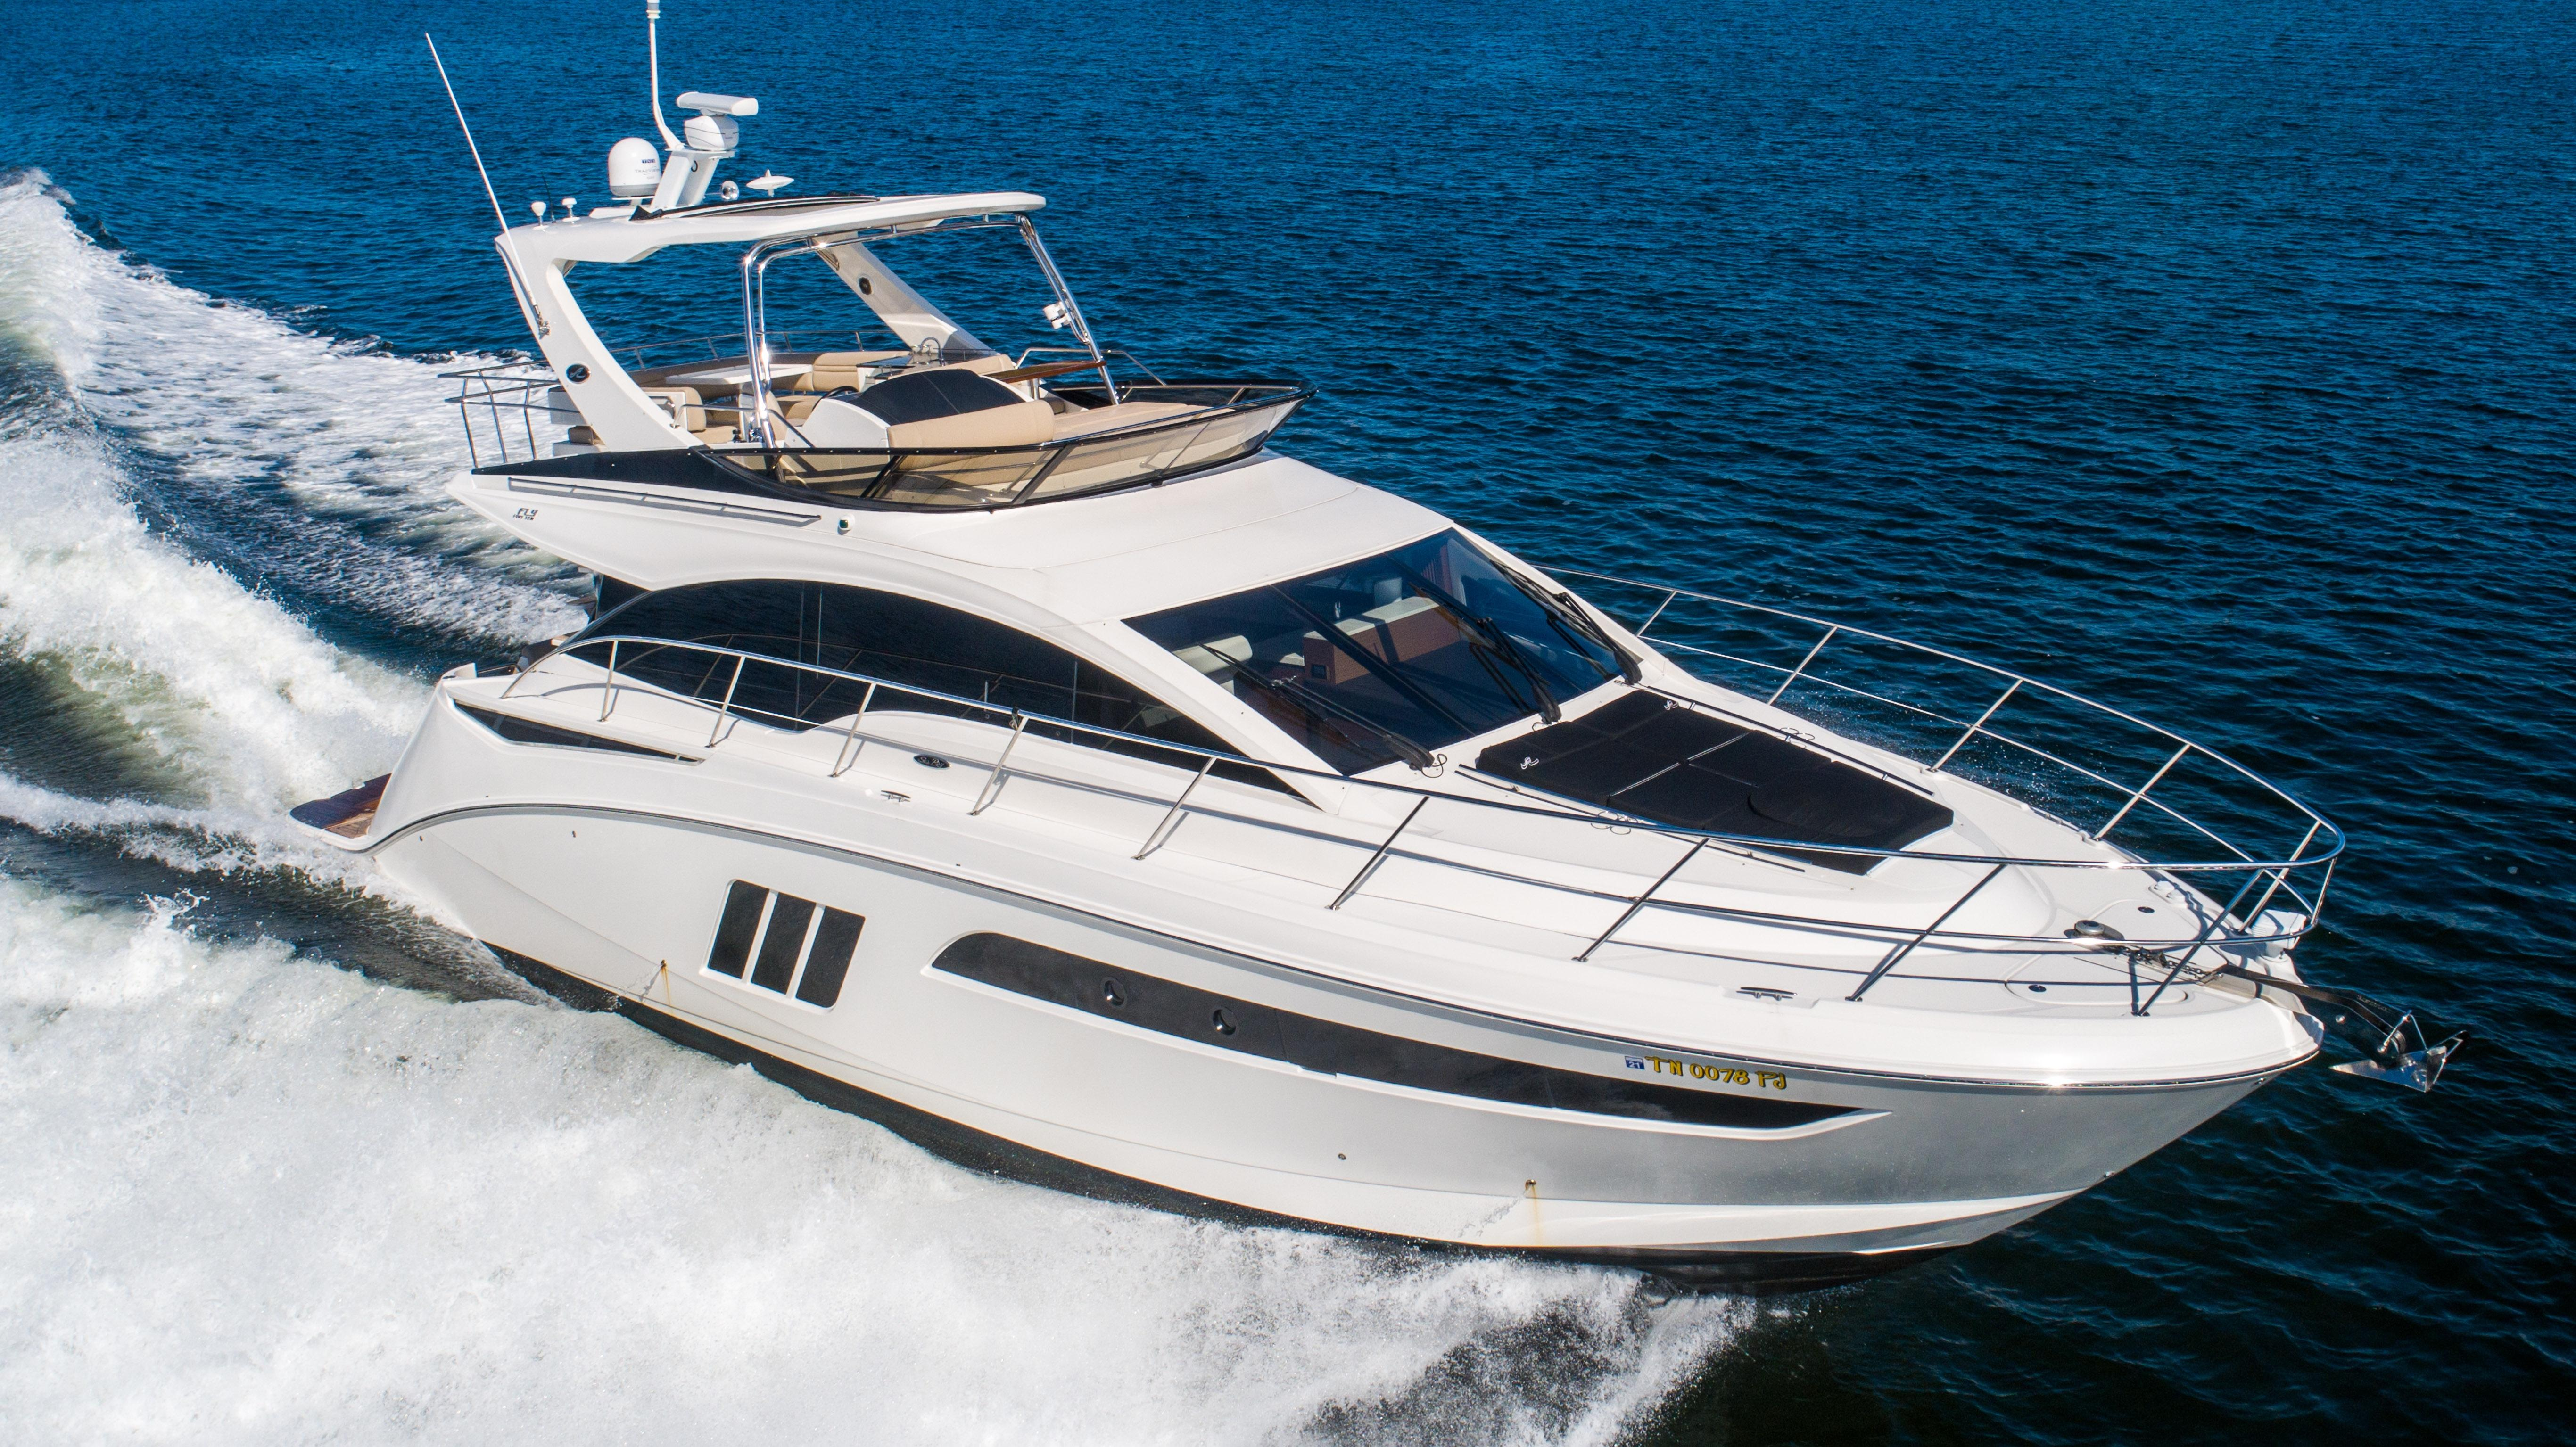 51 Sea Ray Butternut 2016 Fort Lauderdale Denison Yacht Sales